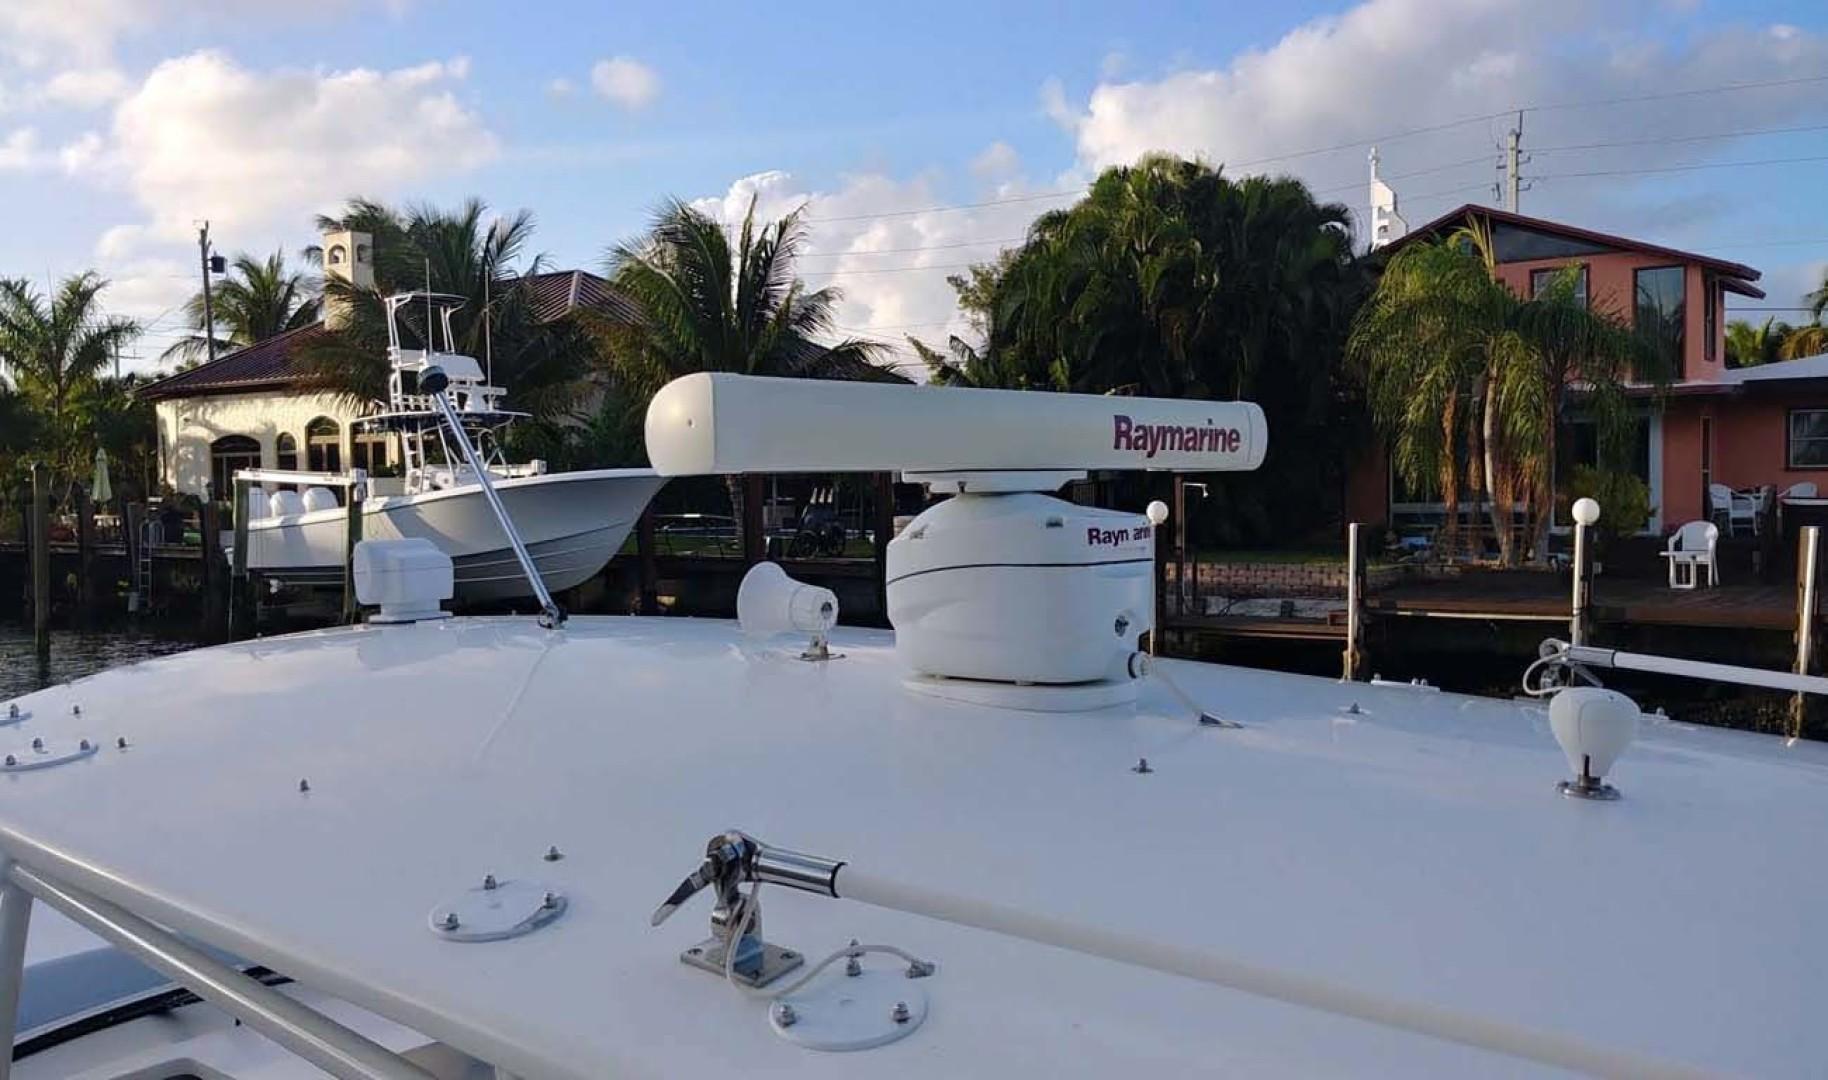 Intrepid-377 Walkaround 2006 -Pompano Beach-Florida-United States-Raymarine Radar-1322770   Thumbnail